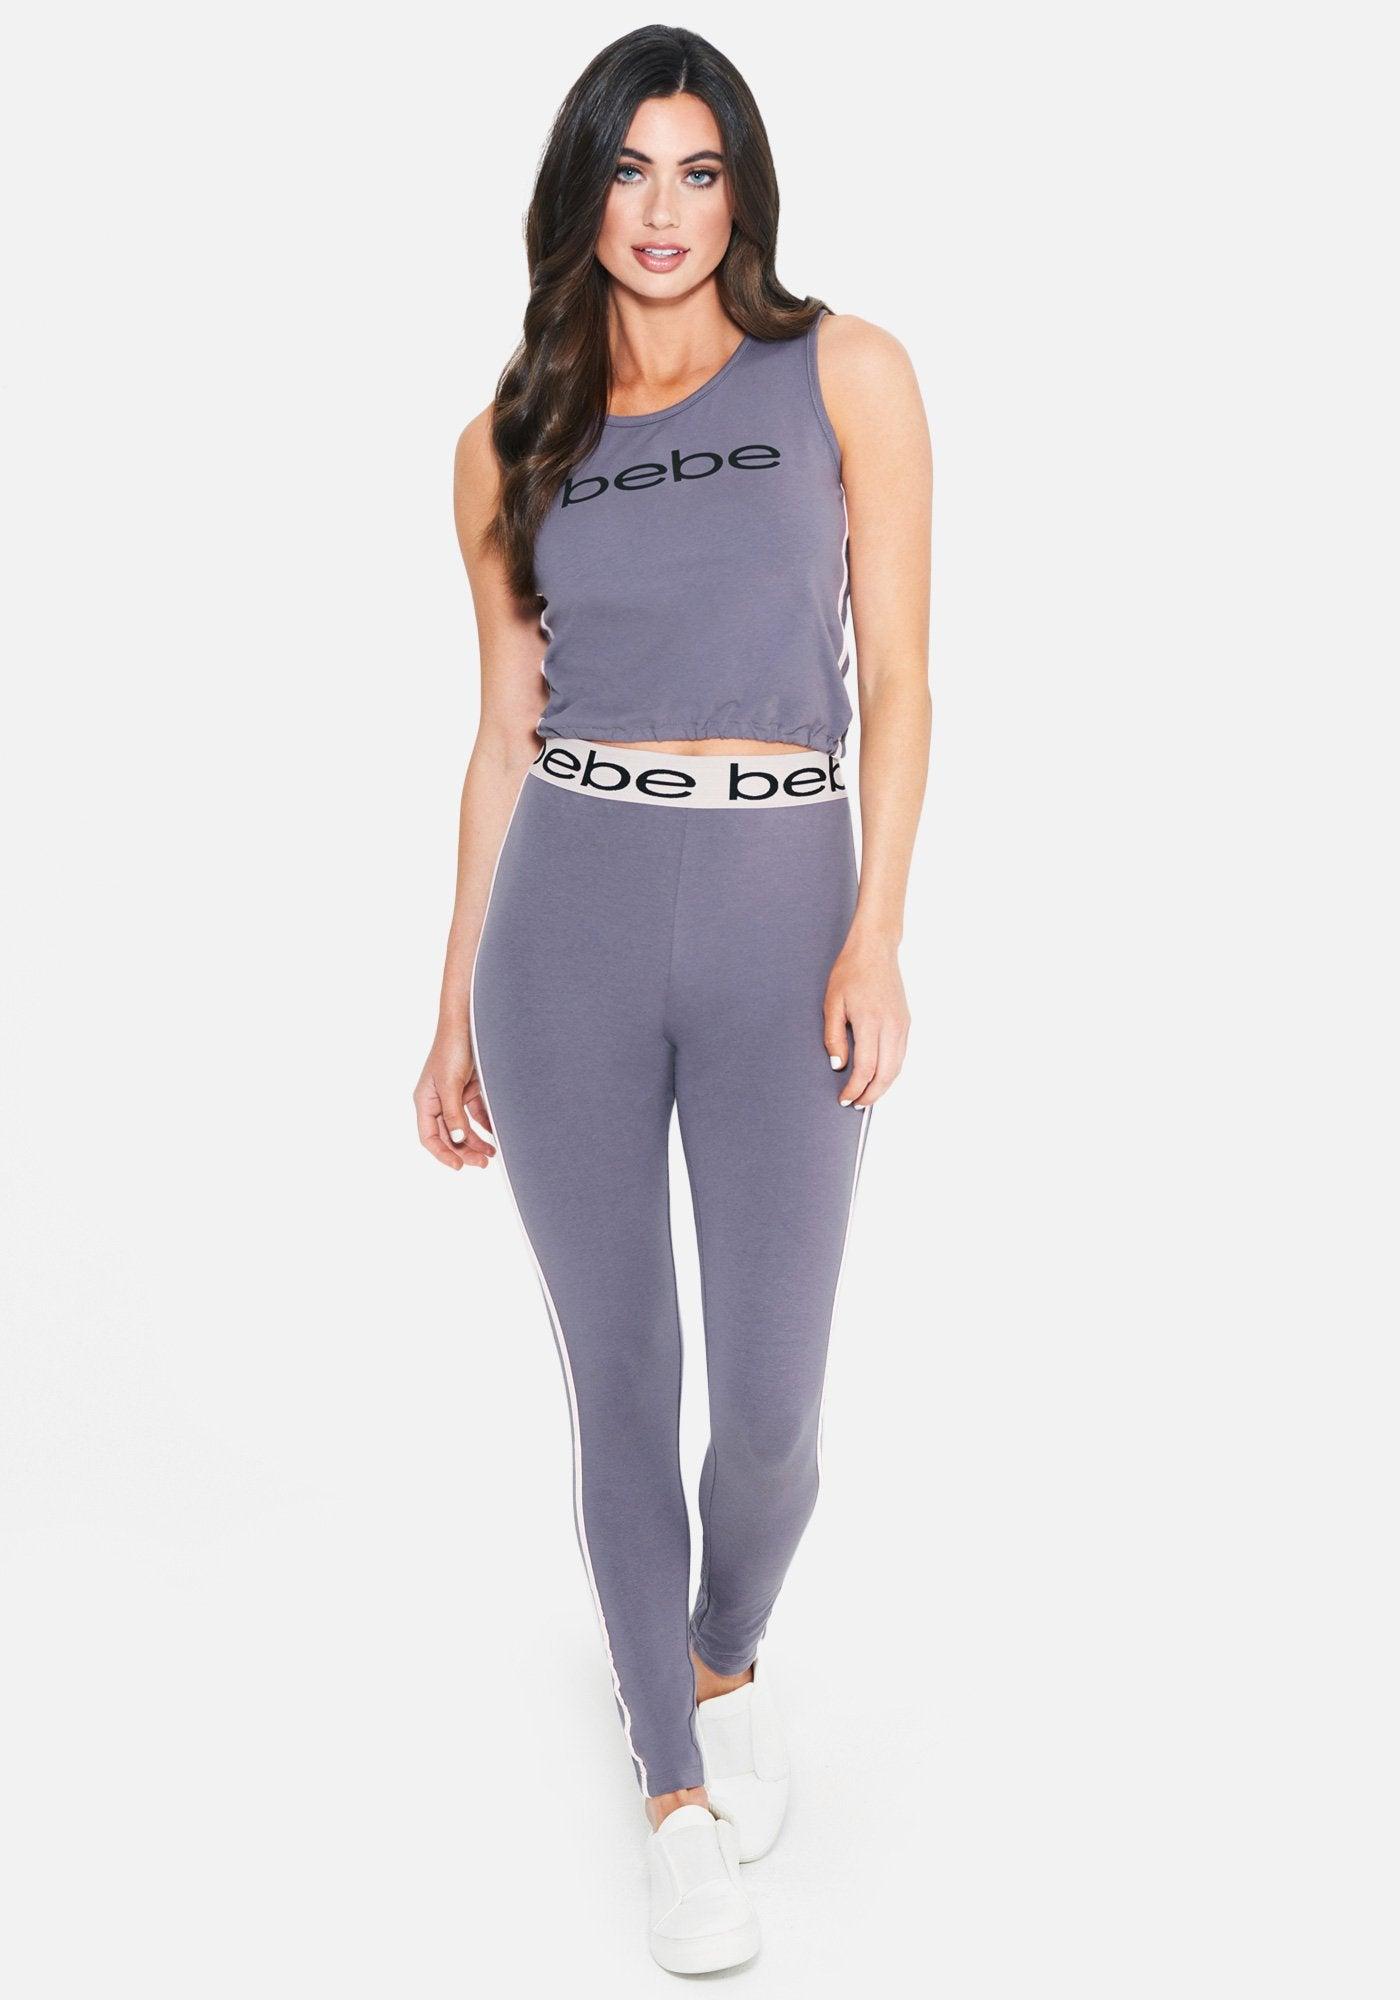 bebe Women's Bebe Logo Crop Tee Shirt Pant Set, Size Small in Midnight Lavendar Cotton/Spandex